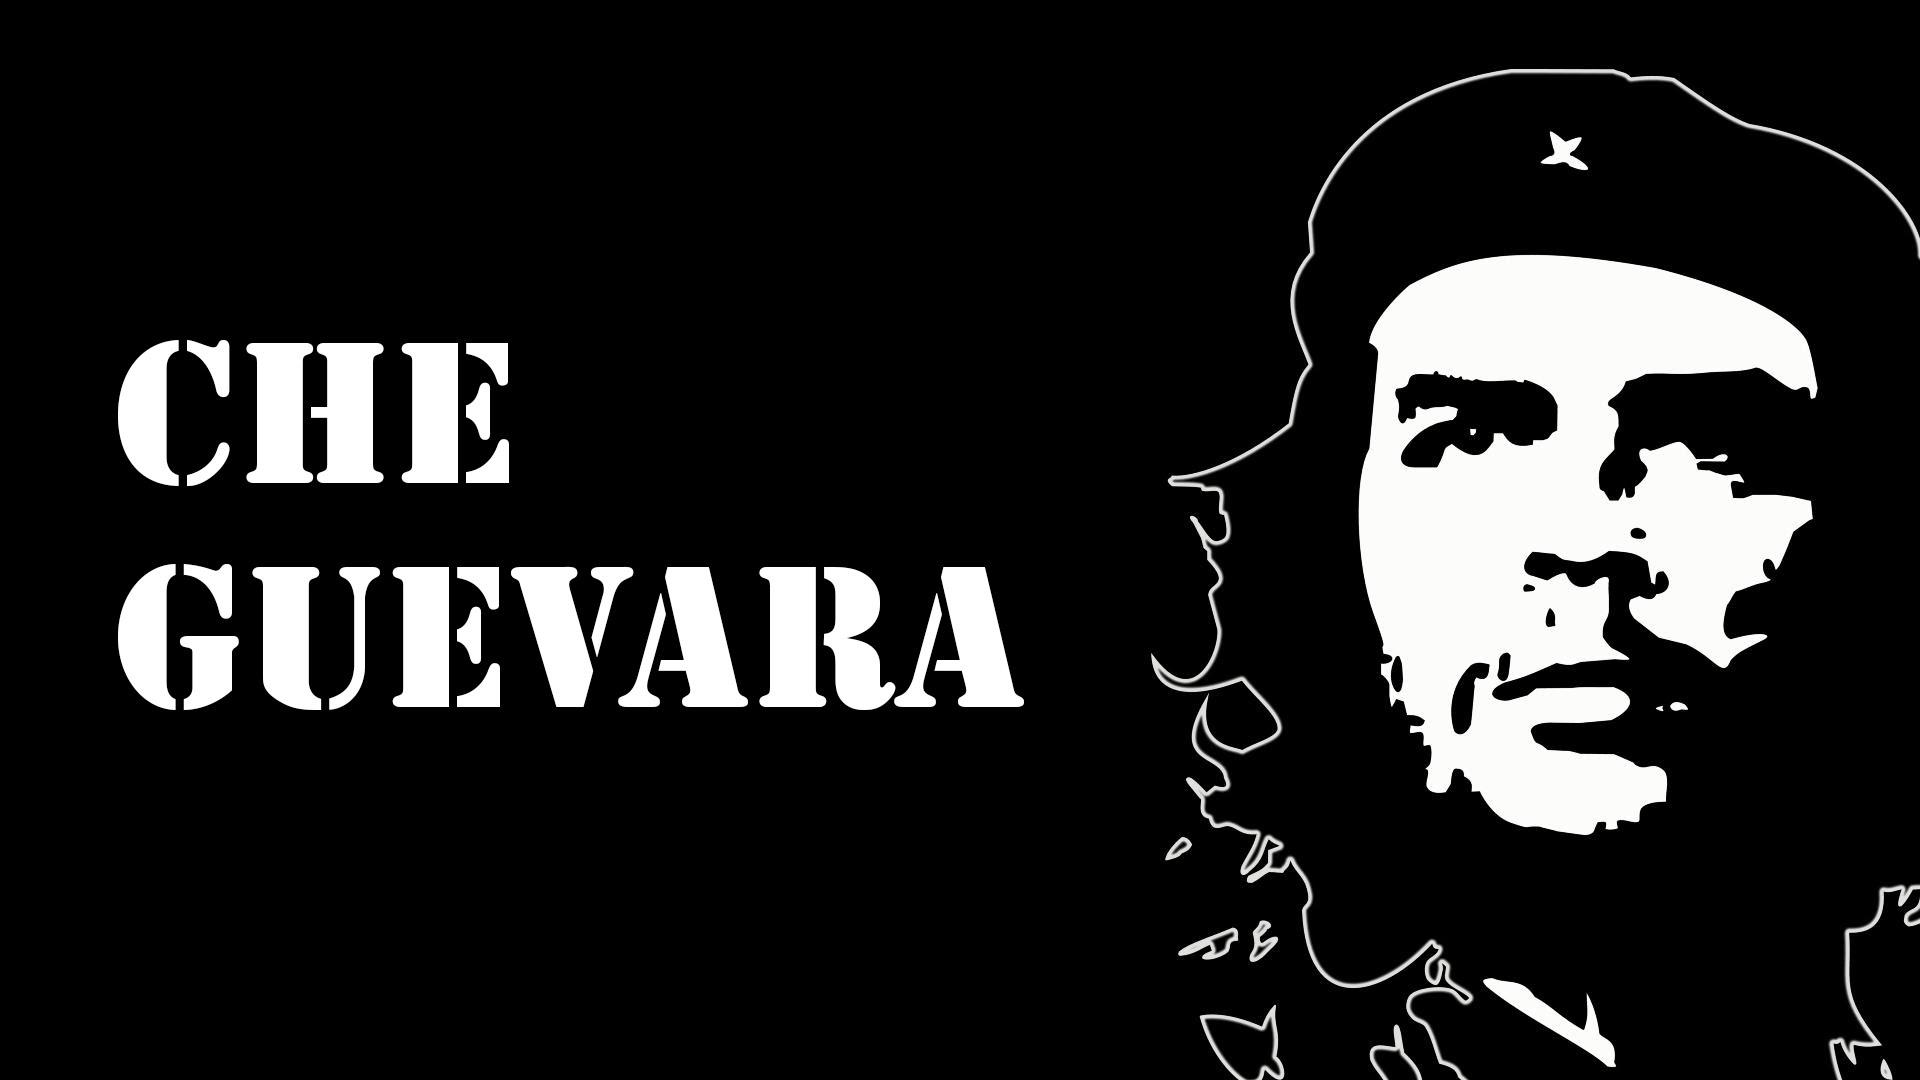 En Güzel Che Guevara Sözleri